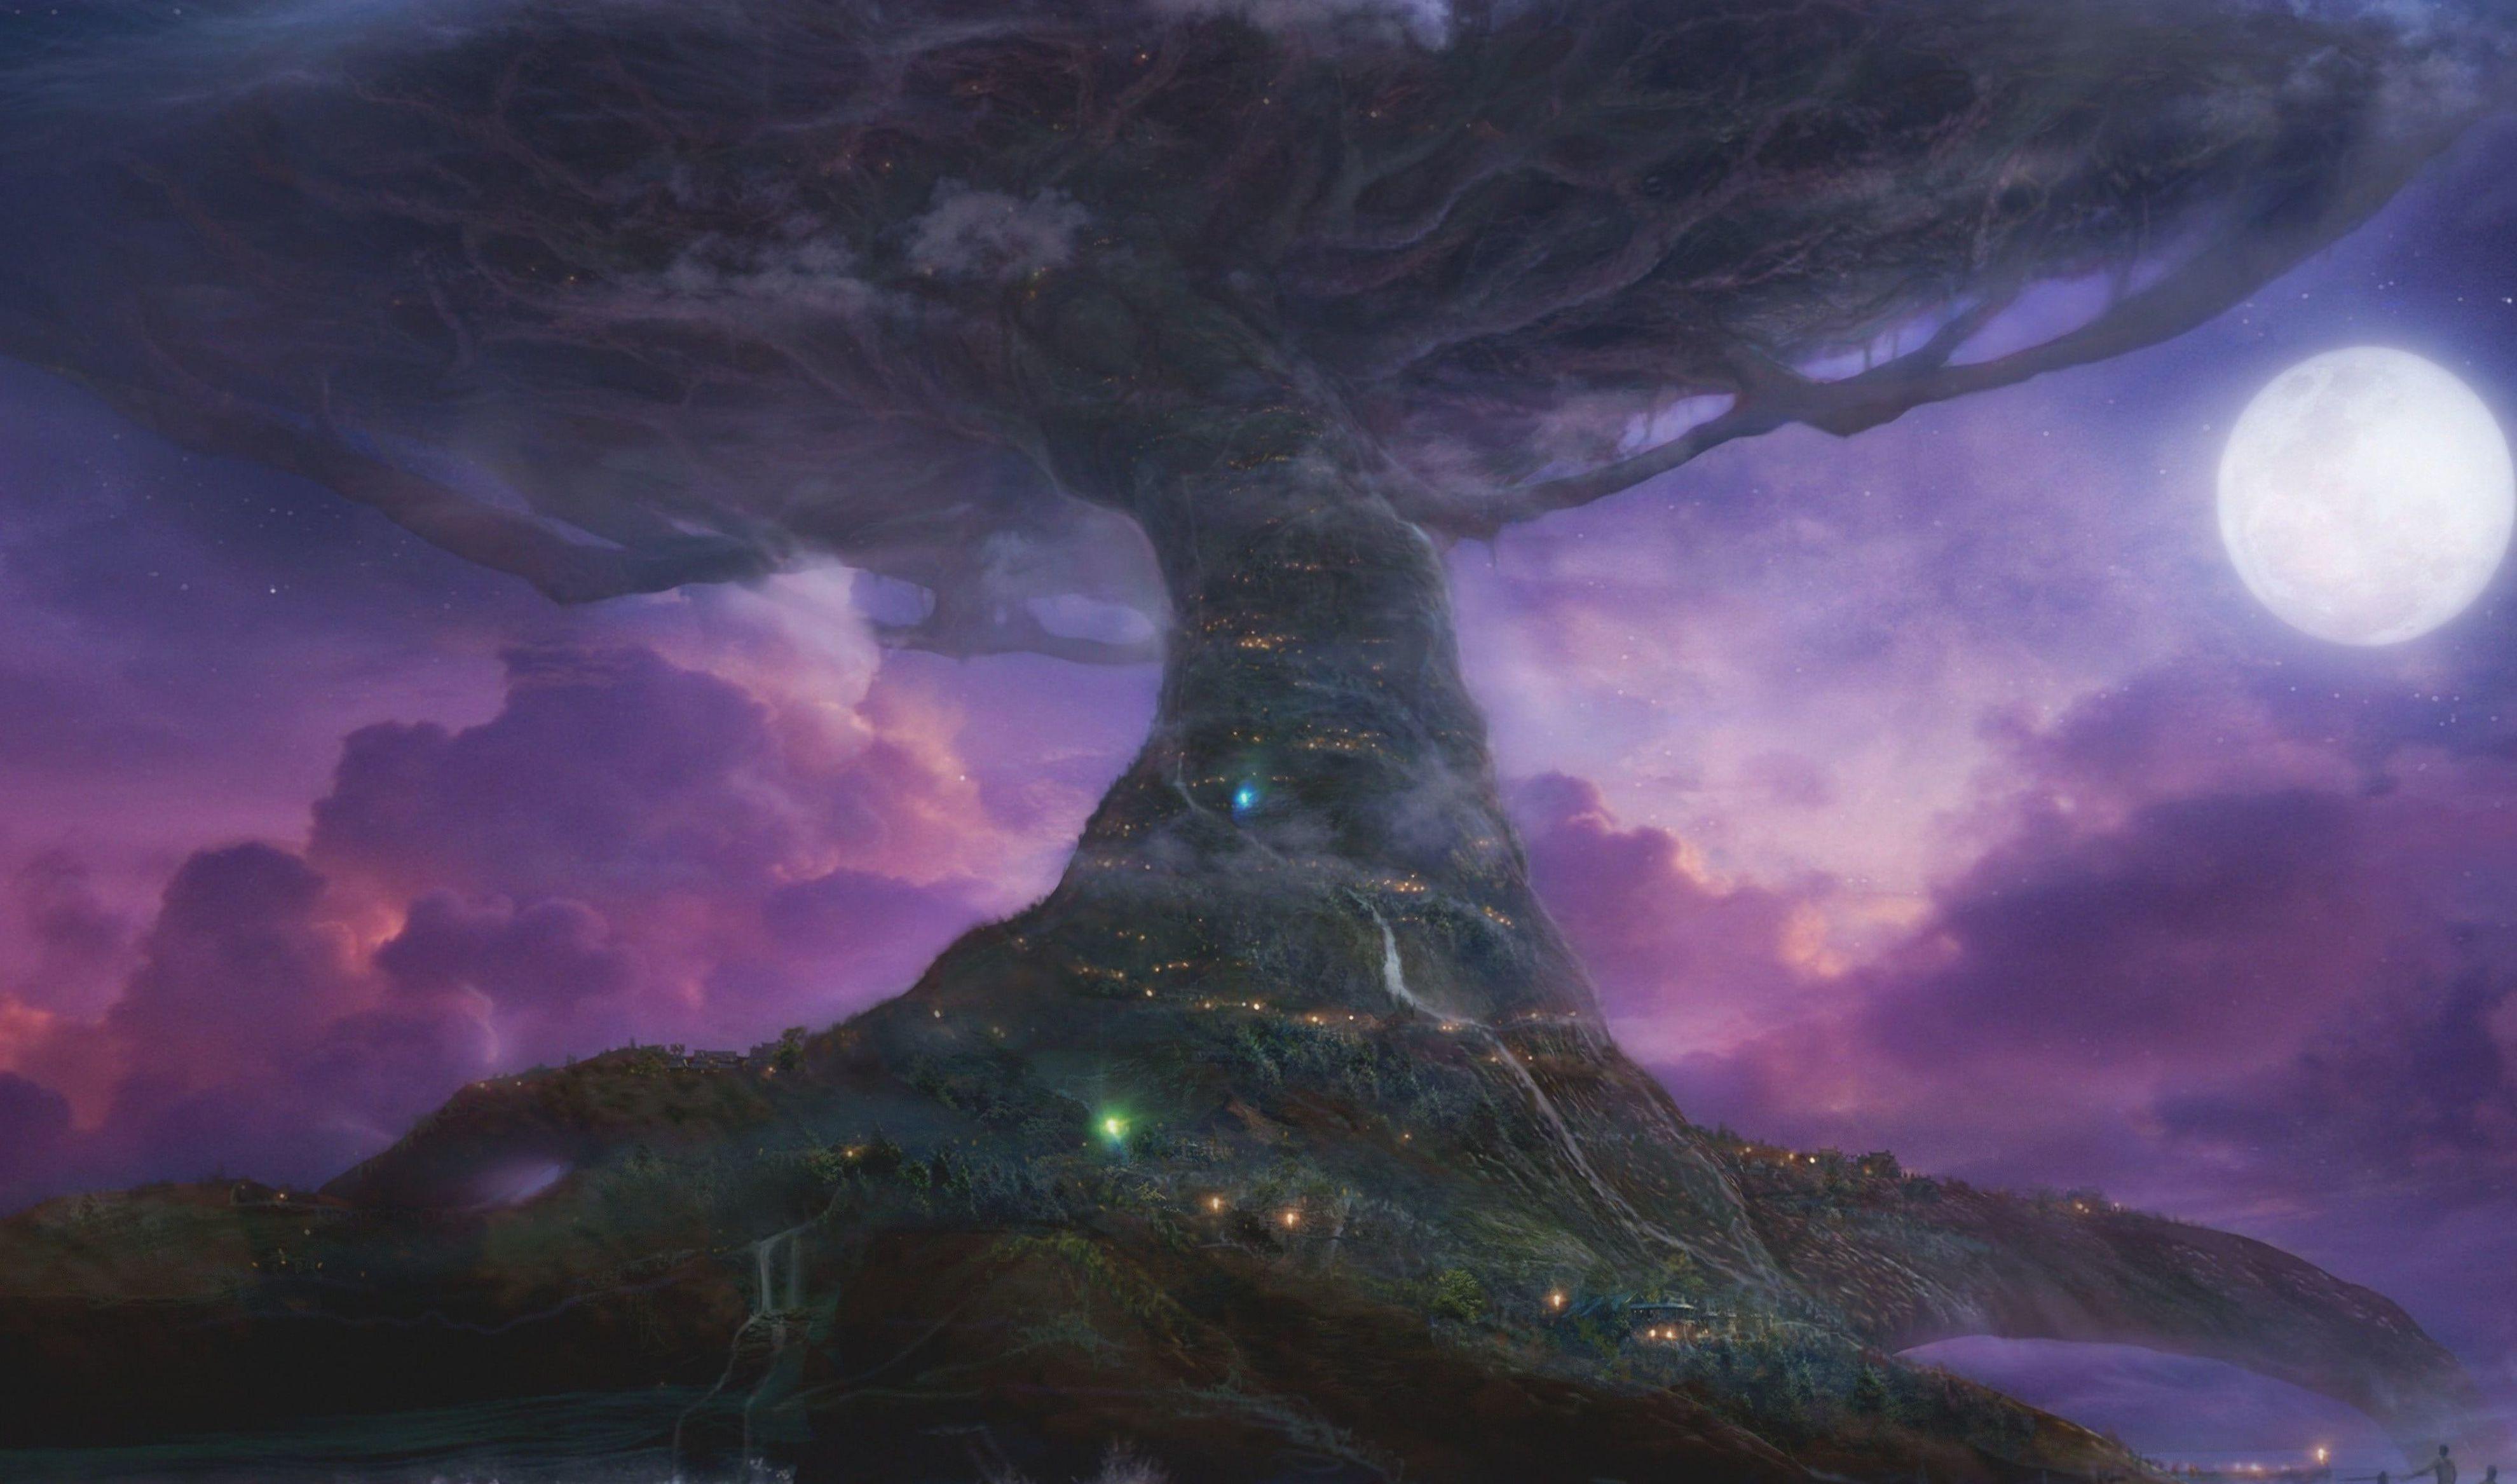 Tree Of Life Illustration Teldrassil World Of Warcraft World Tree Trees Moon Purple Darnassus V World Of Warcraft Wallpaper Warcraft Art Fantasy Landscape